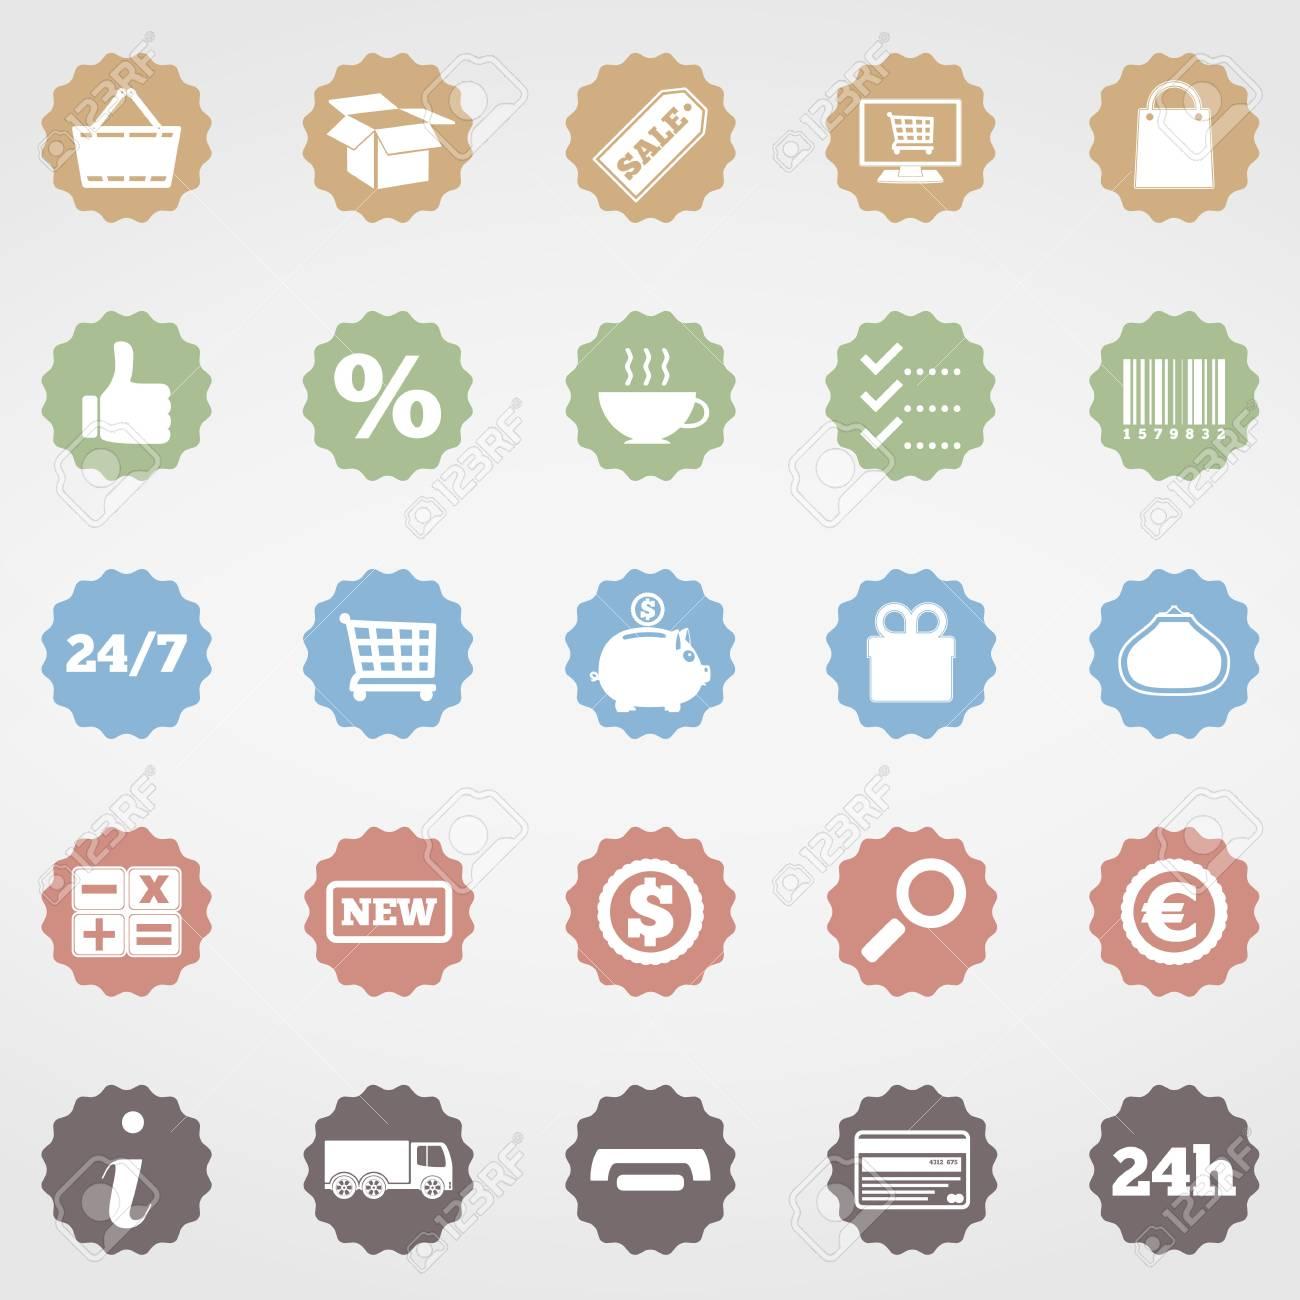 Shopping Icons Stock Vector - 20351233